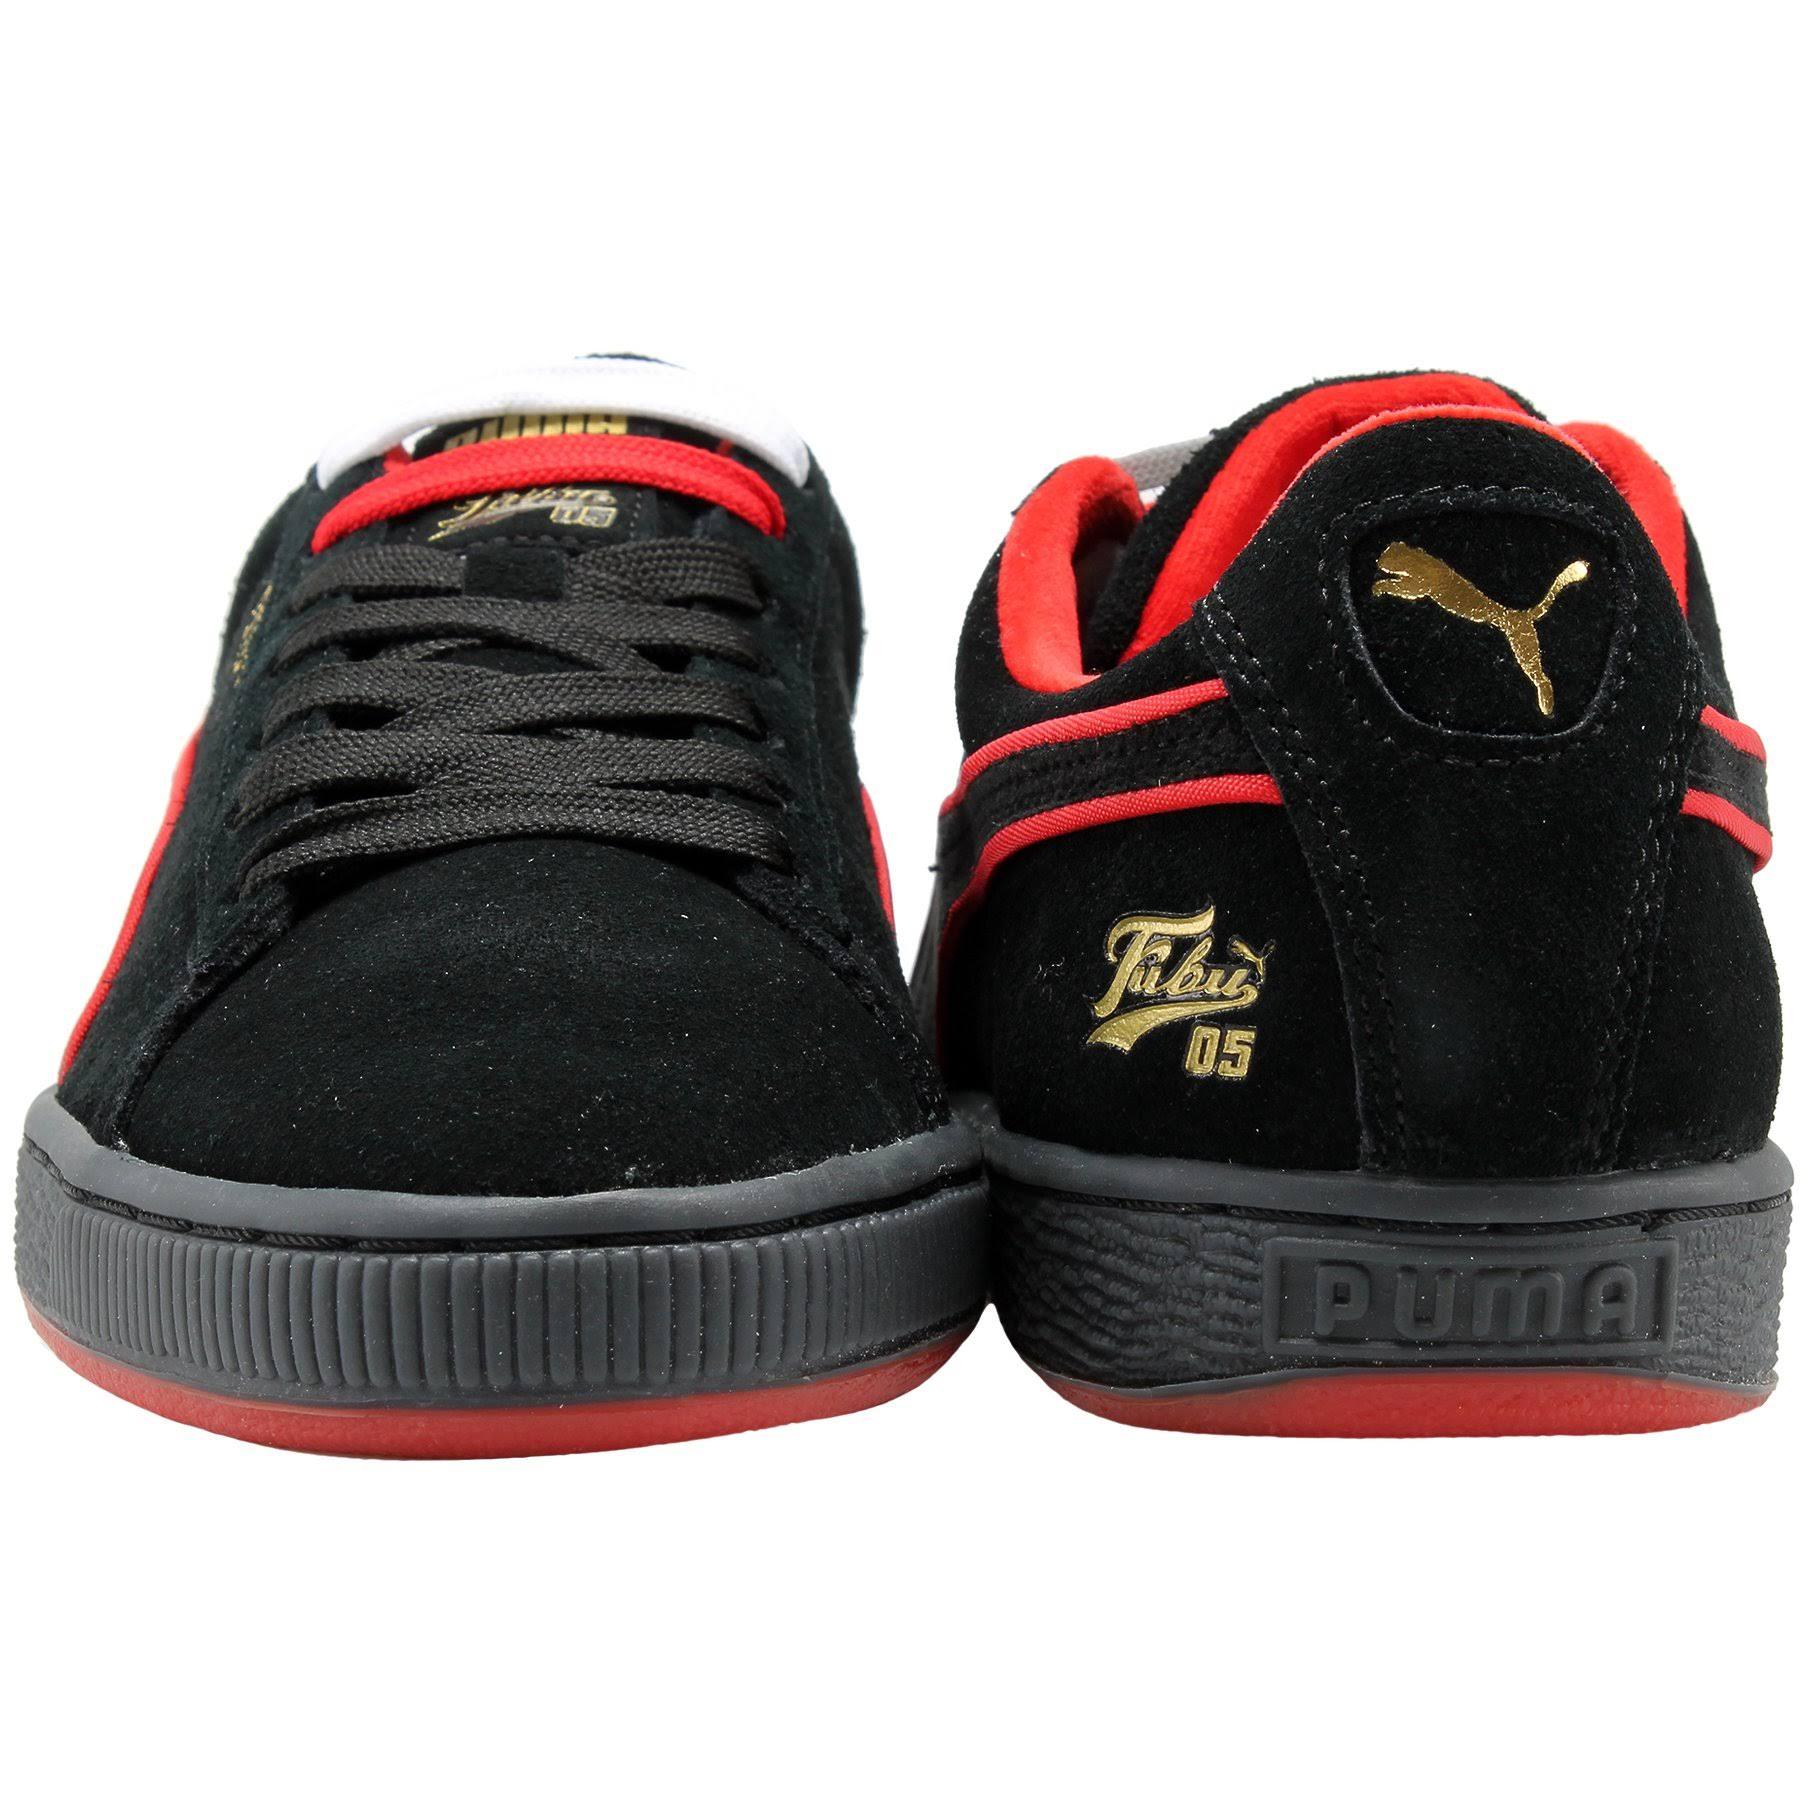 36632002001 5 Alto Rojo Classic Zapatos Para Negro Puma Oro Tamaño Suede Riesgo 11 Hombre Z8qvxX7